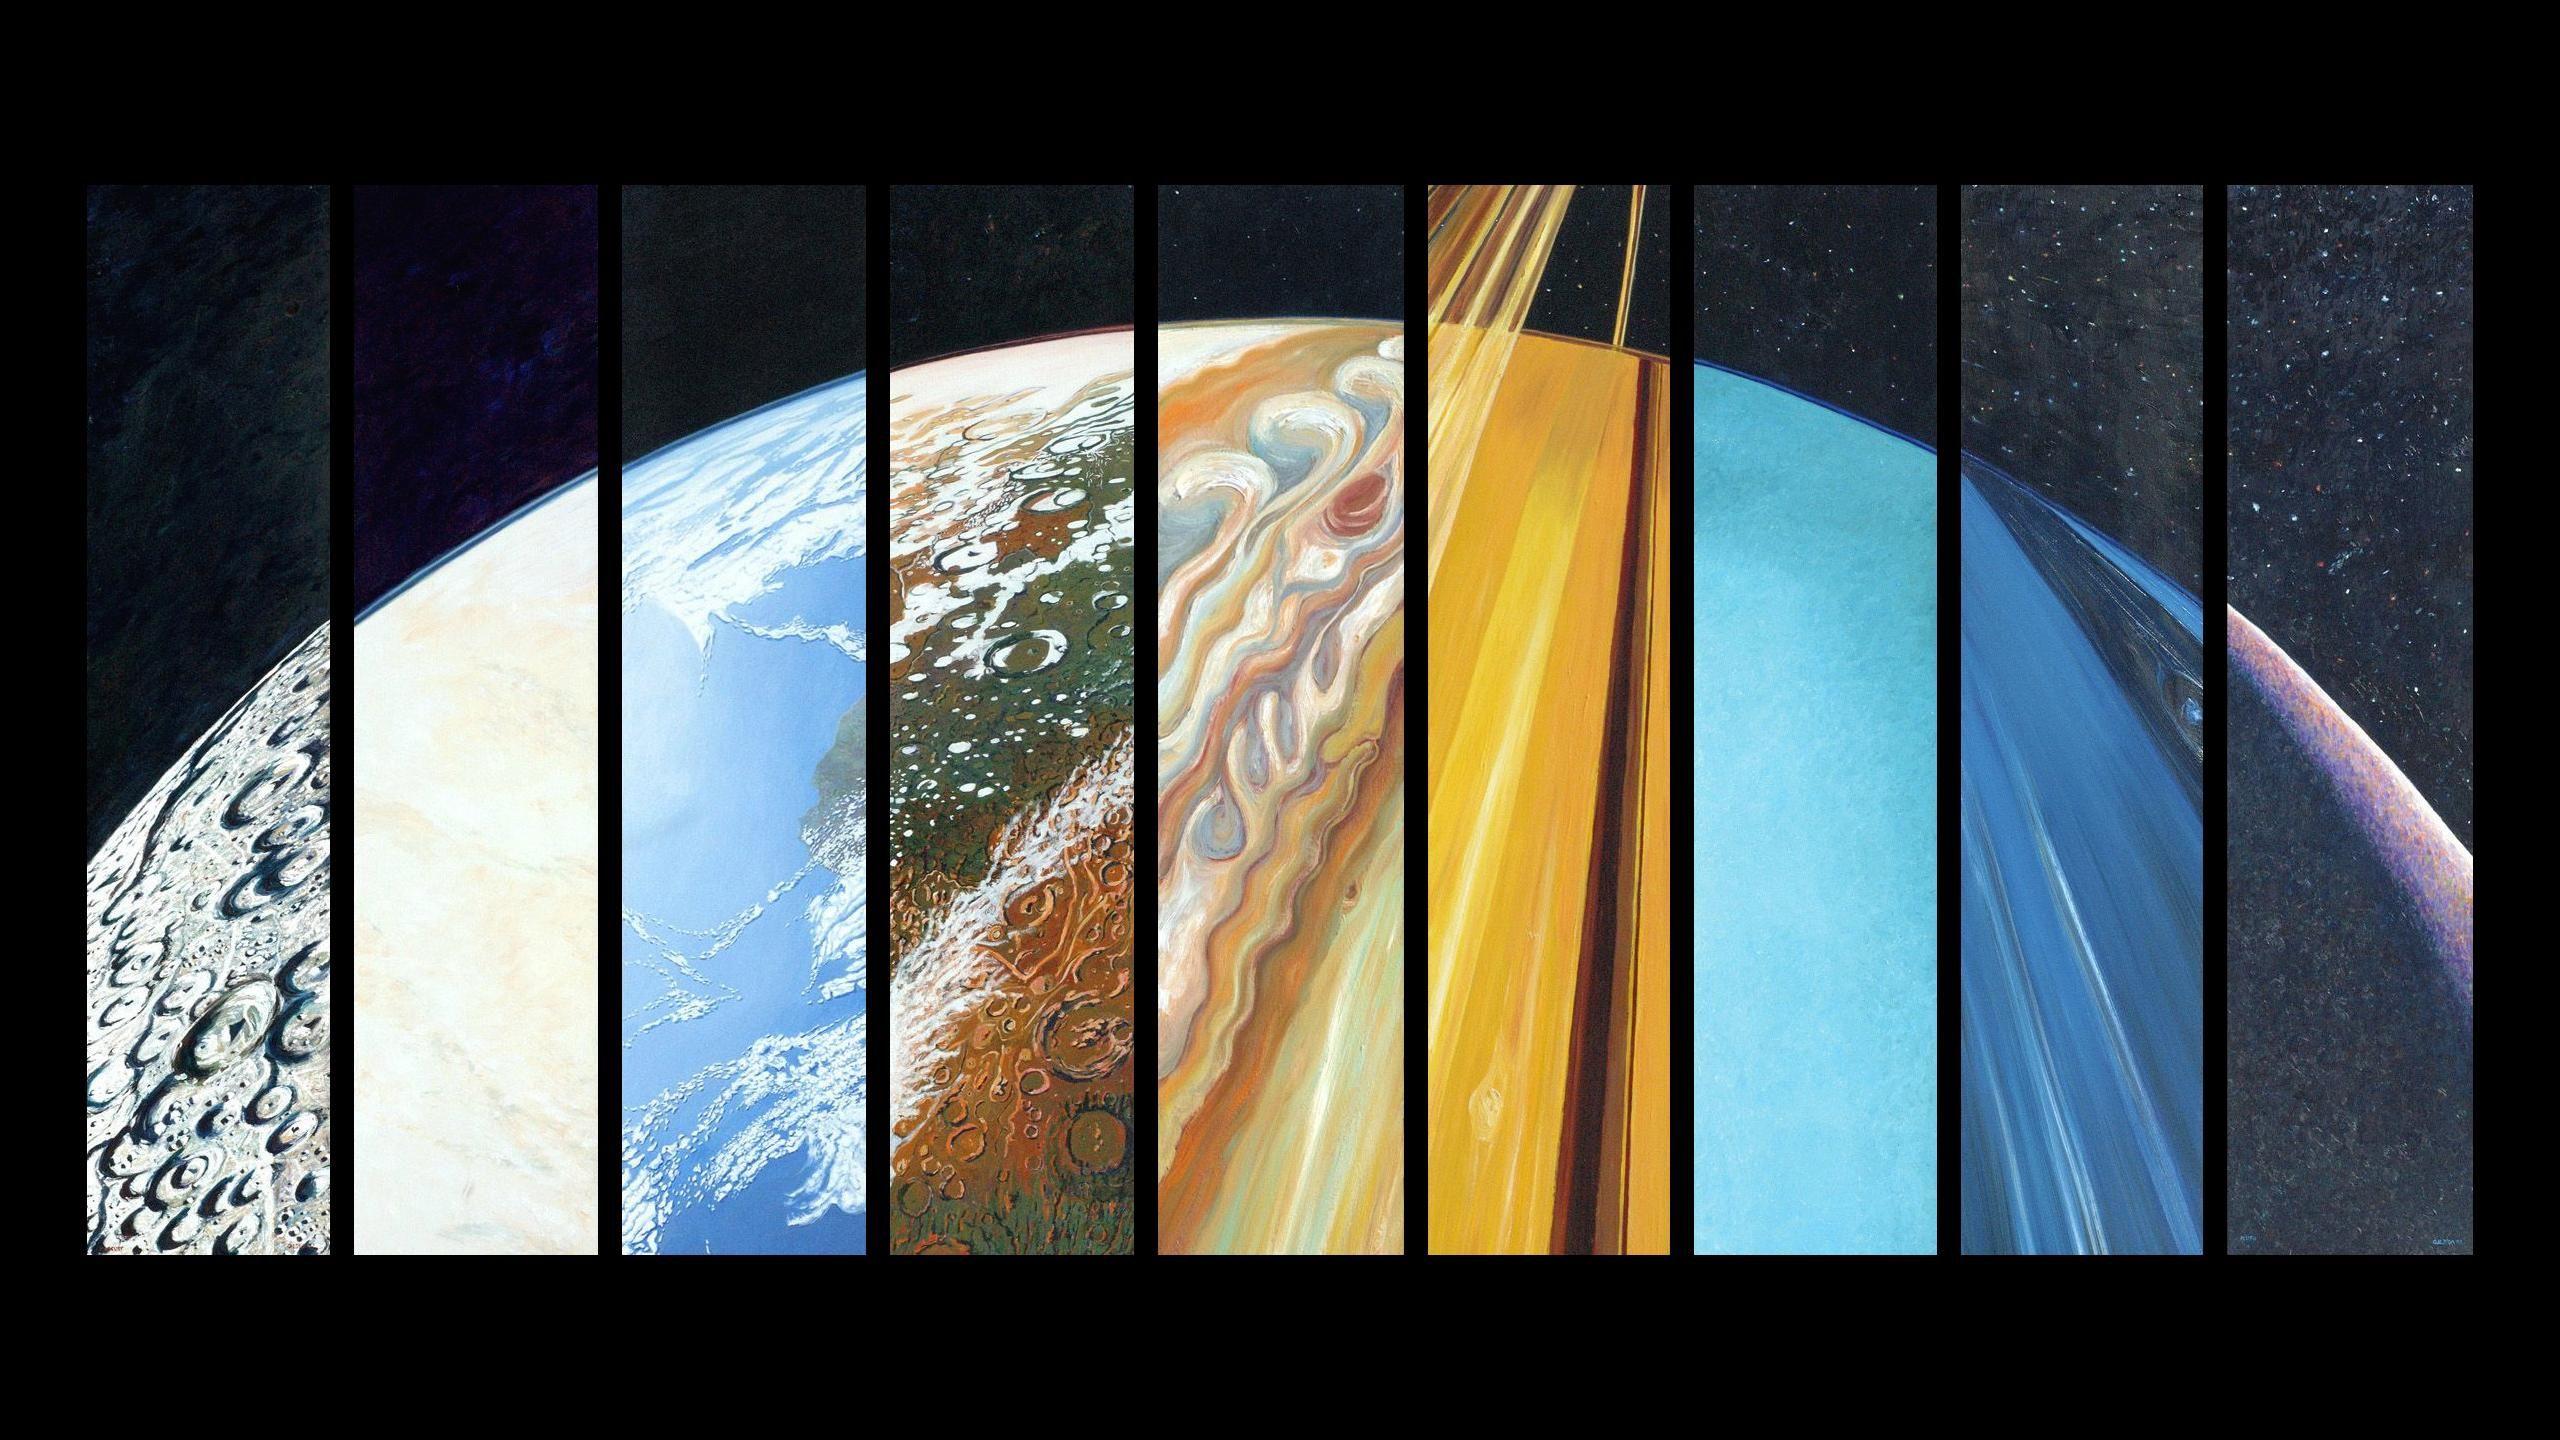 WQHD (1440p) wallpaper remake of the Steve Gildea's